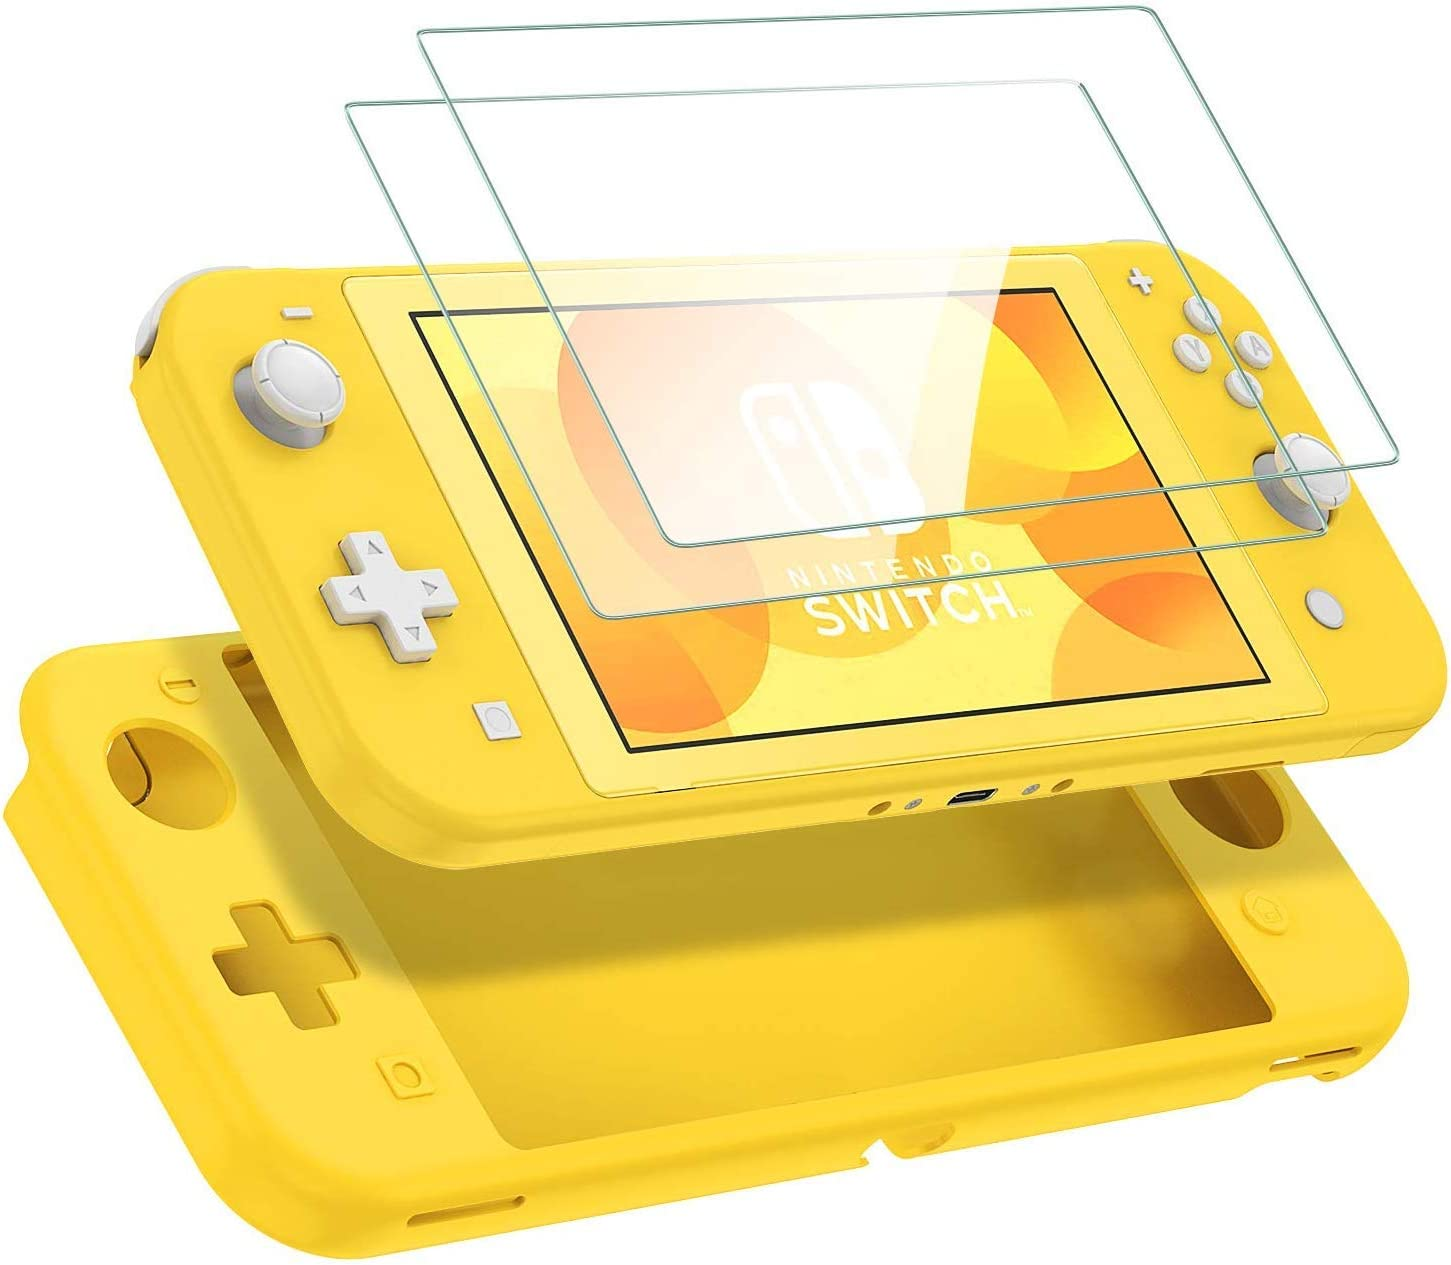 VOEER Funda Carcasa para Nintendo Switch Lite, Suave Silicona Funda Ultrafina TPU Anti-arañazo Funda Protectora para Nintendo Switch Lite con Protector de Pantalla de Vidrio Templado (Amarillo): Amazon.es: Electrónica